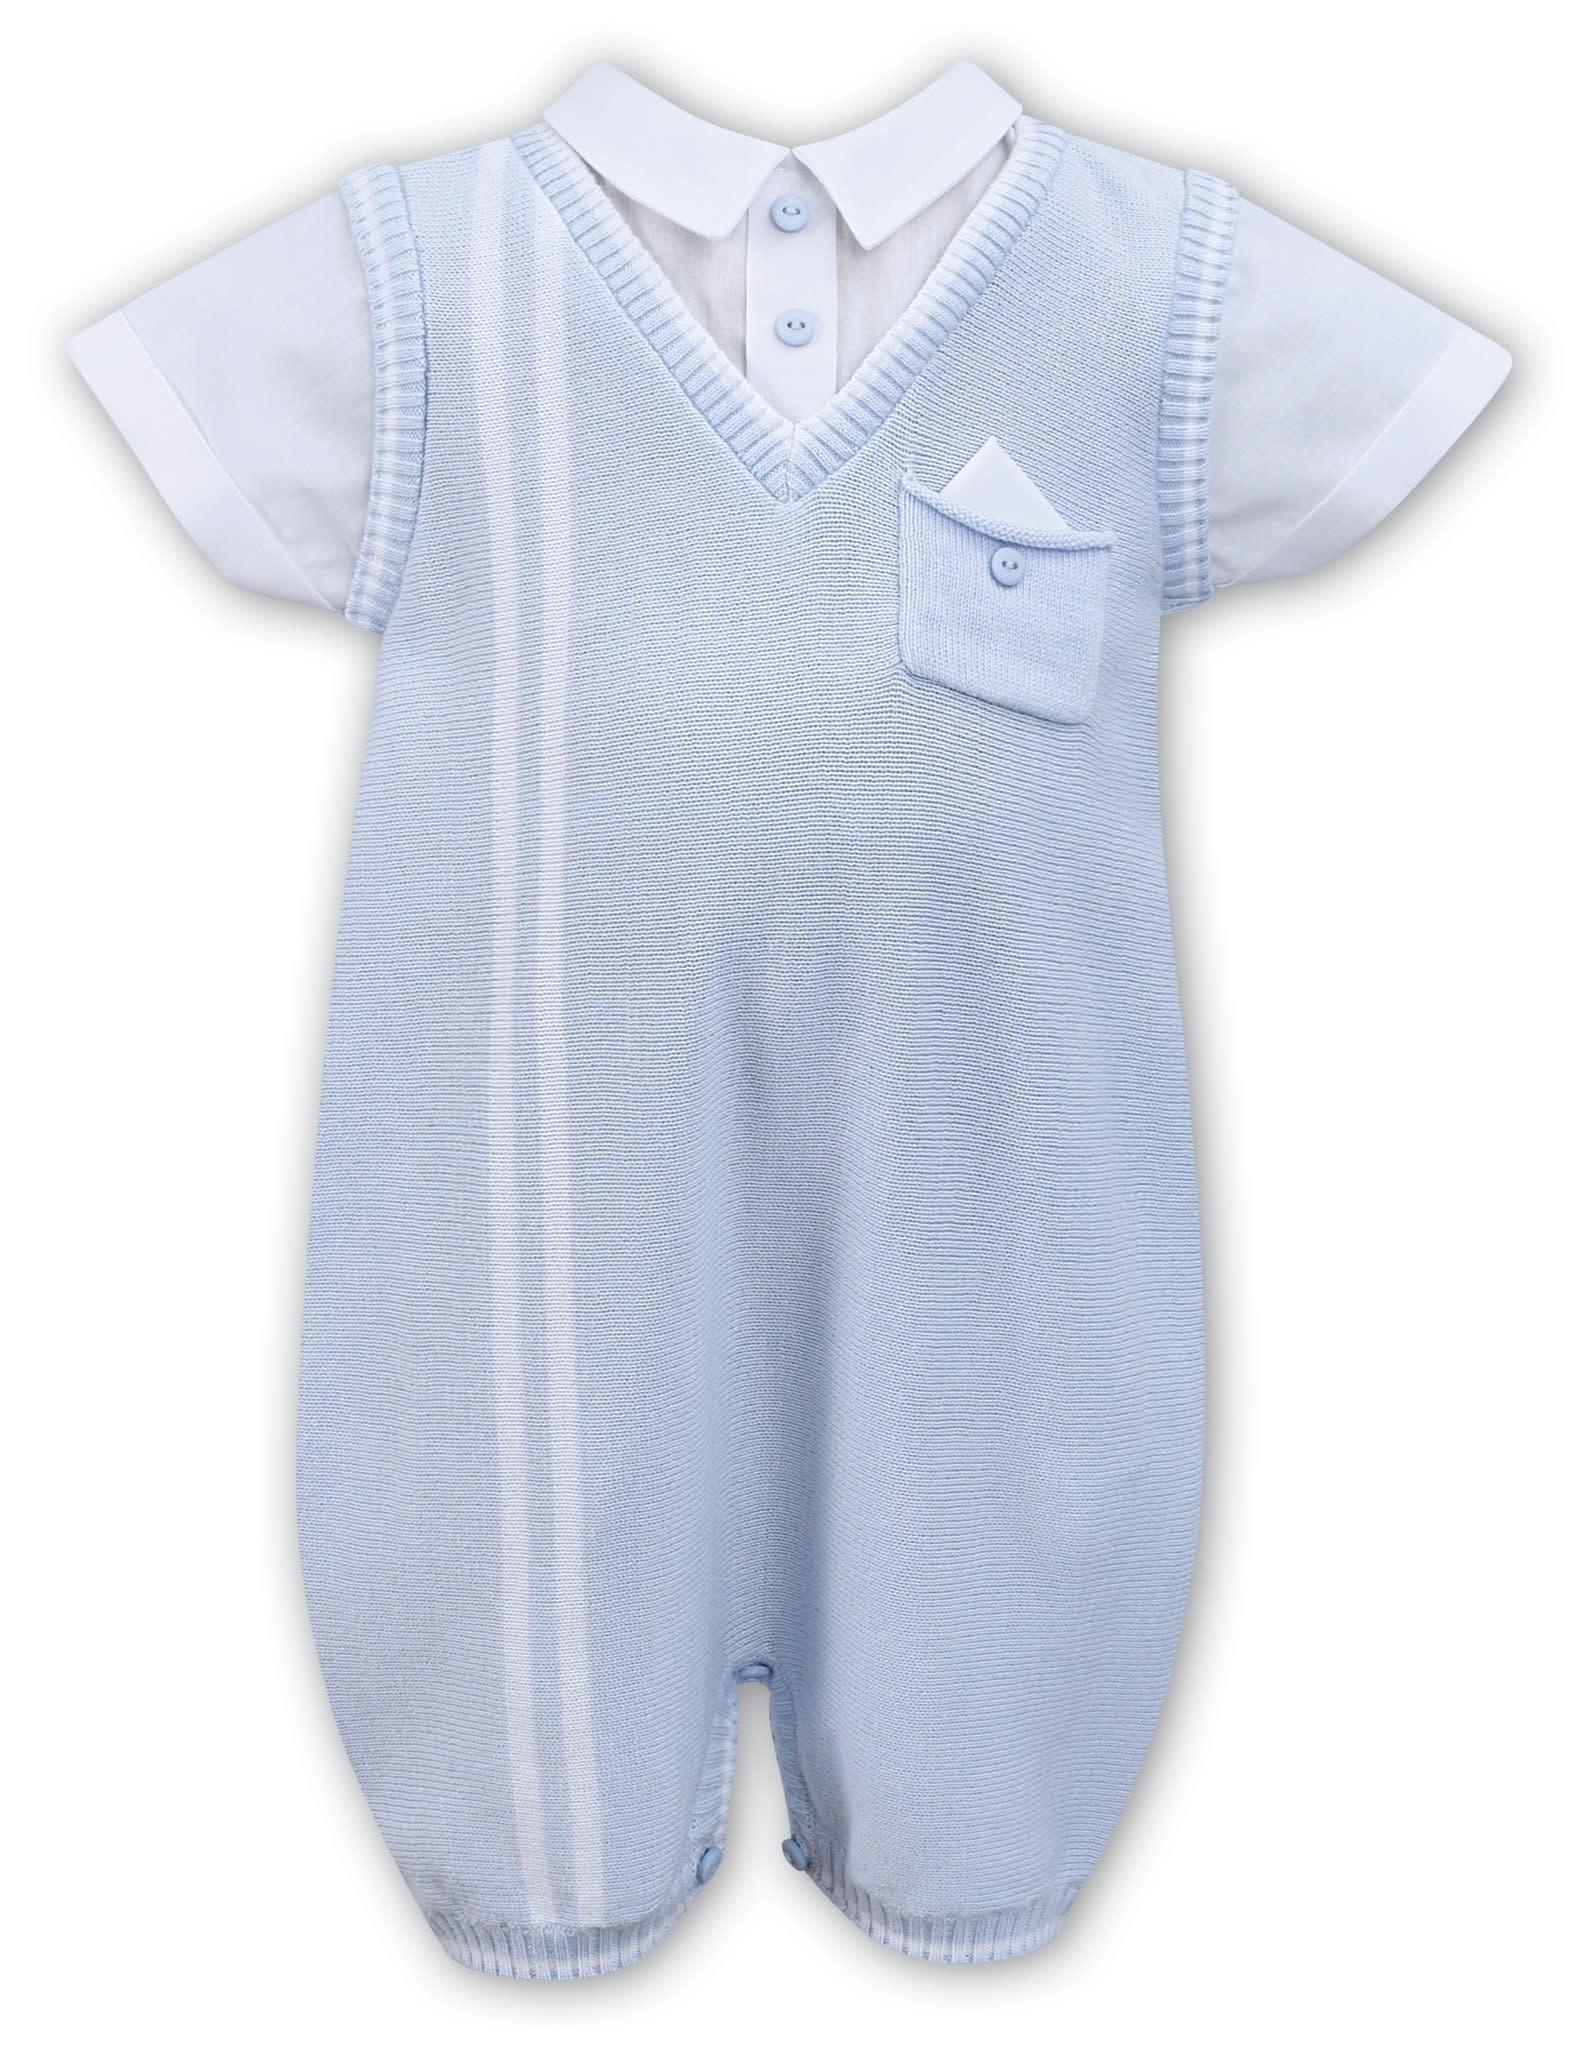 Sarah Louise Sarah Louise D09336 Boys Blue Knit Romper